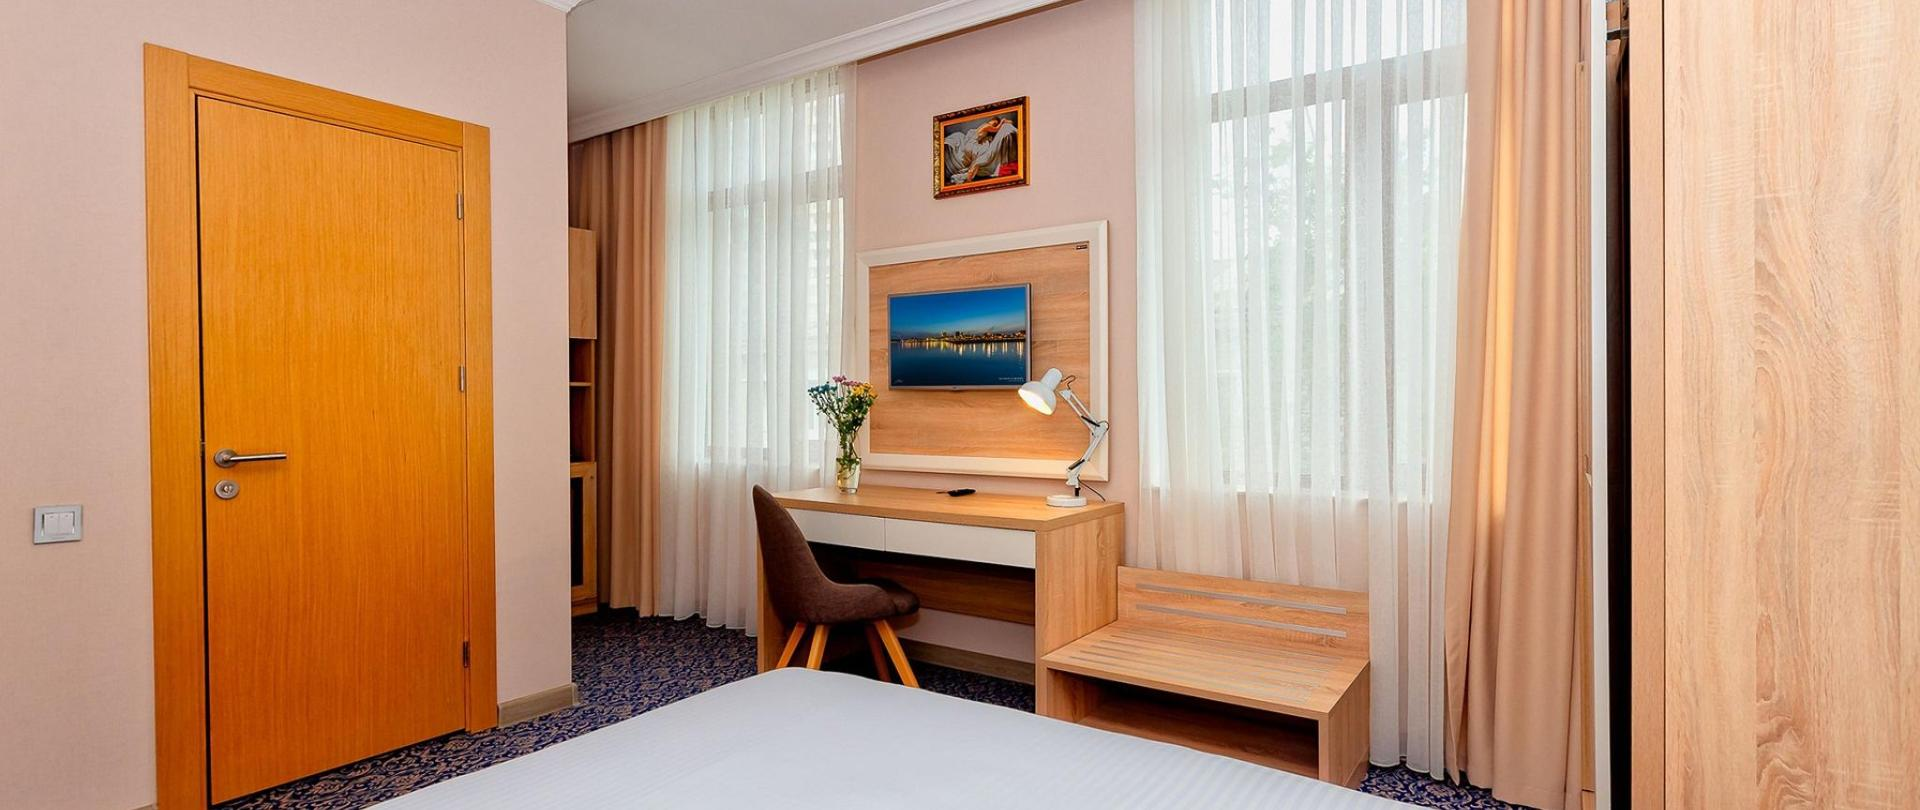 Metrocity Hotel-20.jpg